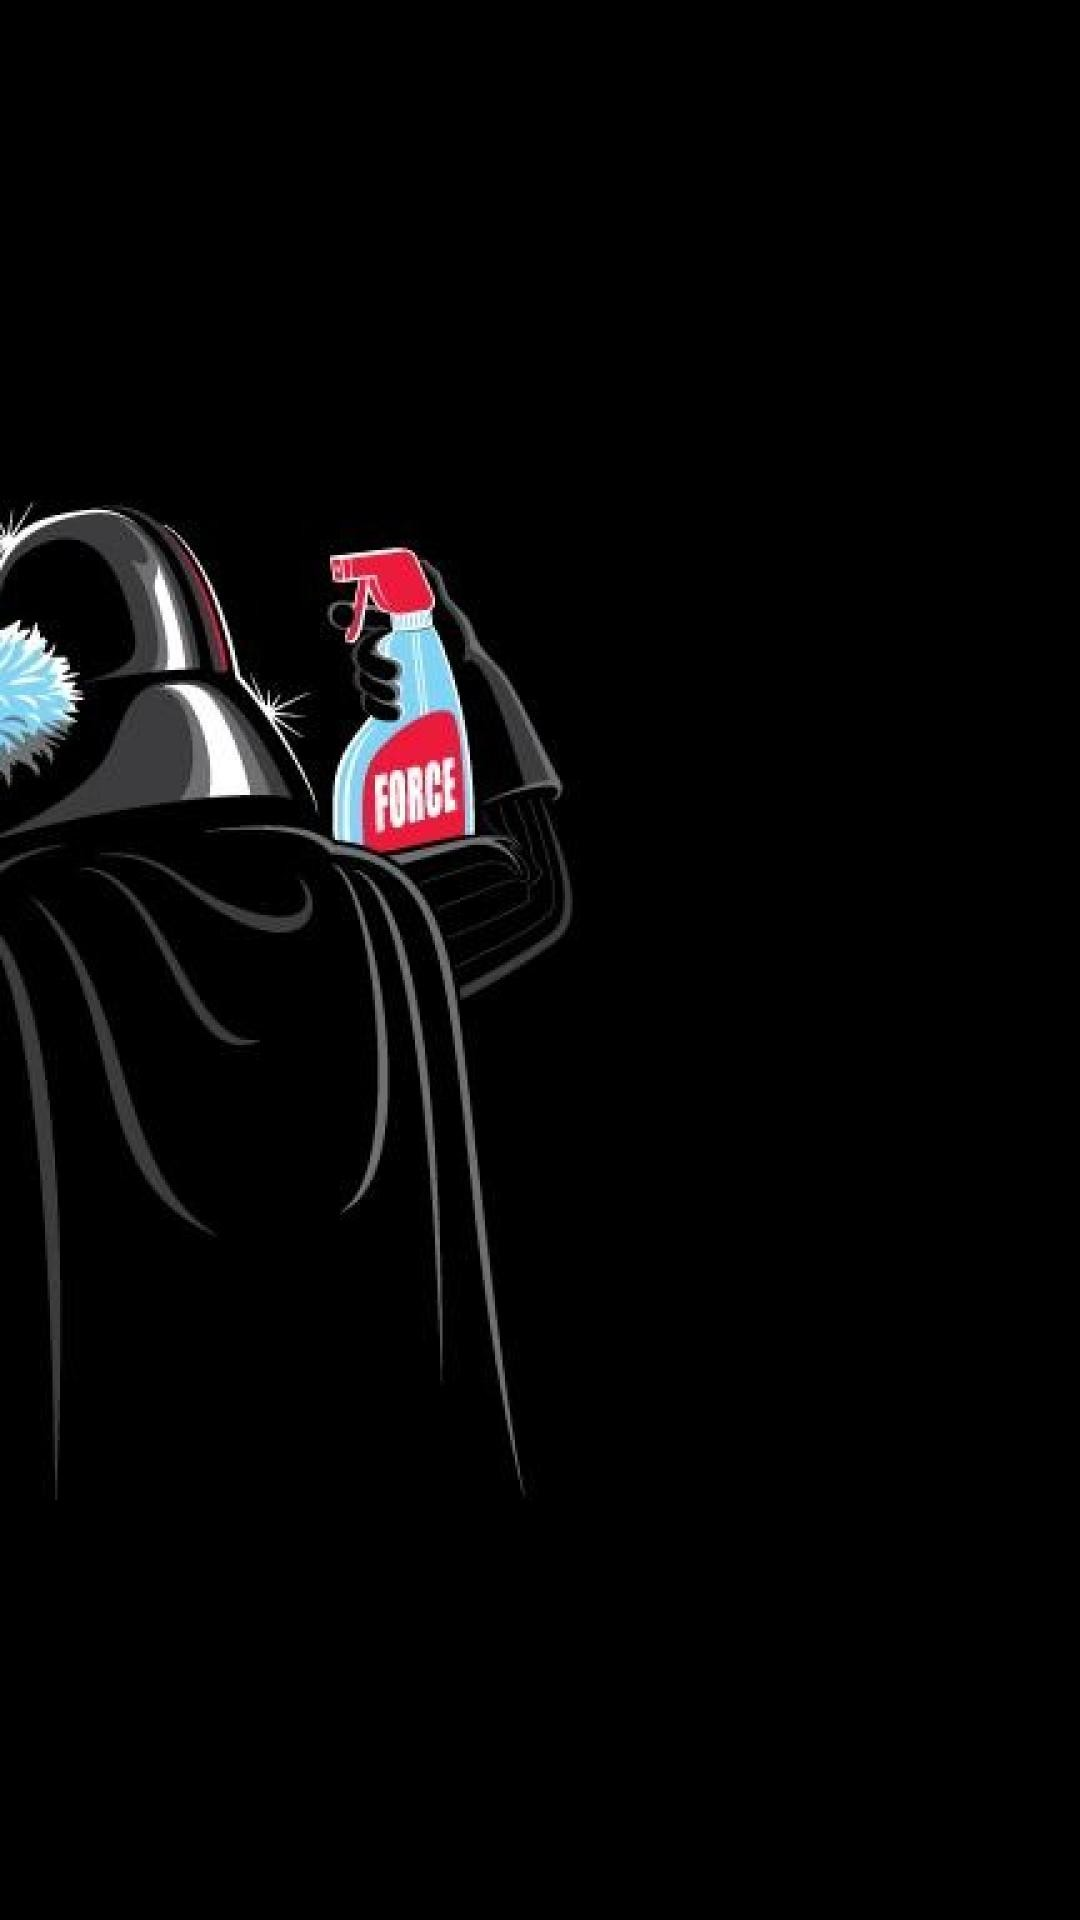 Funny Star Wars Iphone Wallpaper